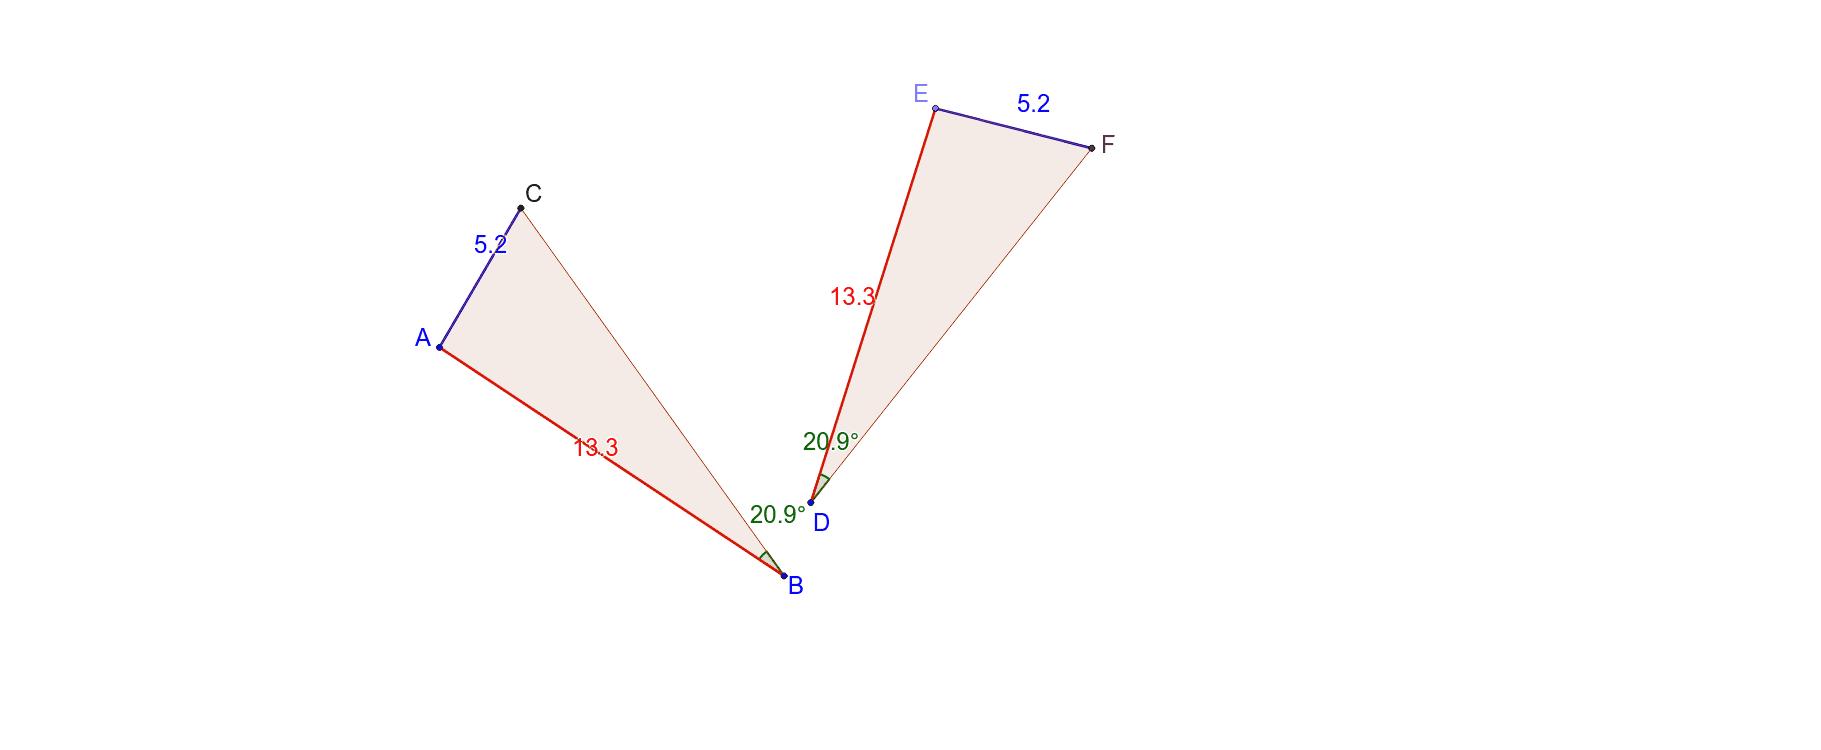 Side-Side-Angle (SSA) Press Enter to start activity